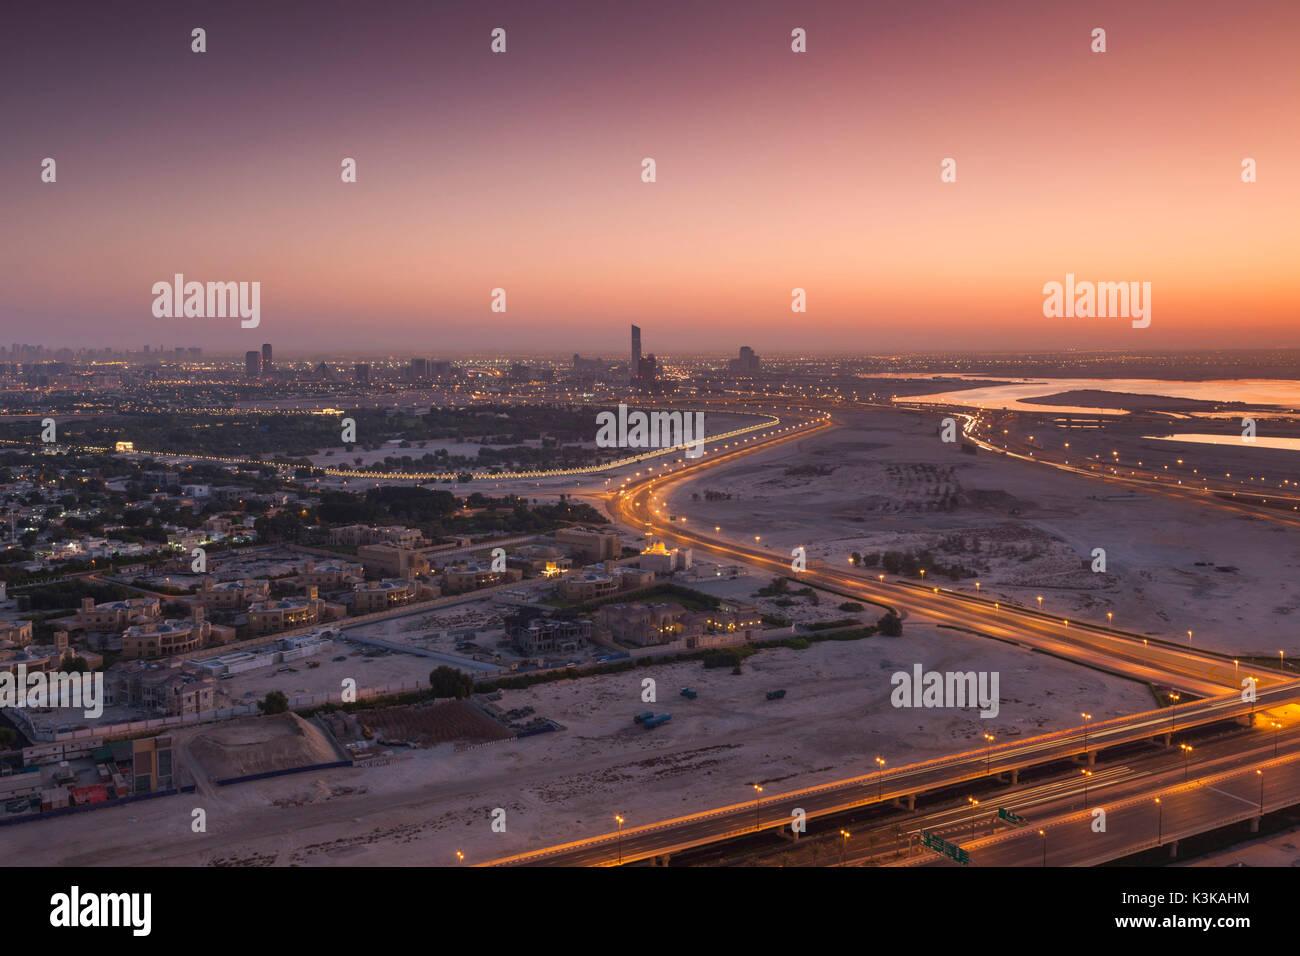 UAE, Dubai, Downtown Dubai, erhöhte Wüste und Autobahn Blick Richtung Ras Al Khor, Dawn Stockbild